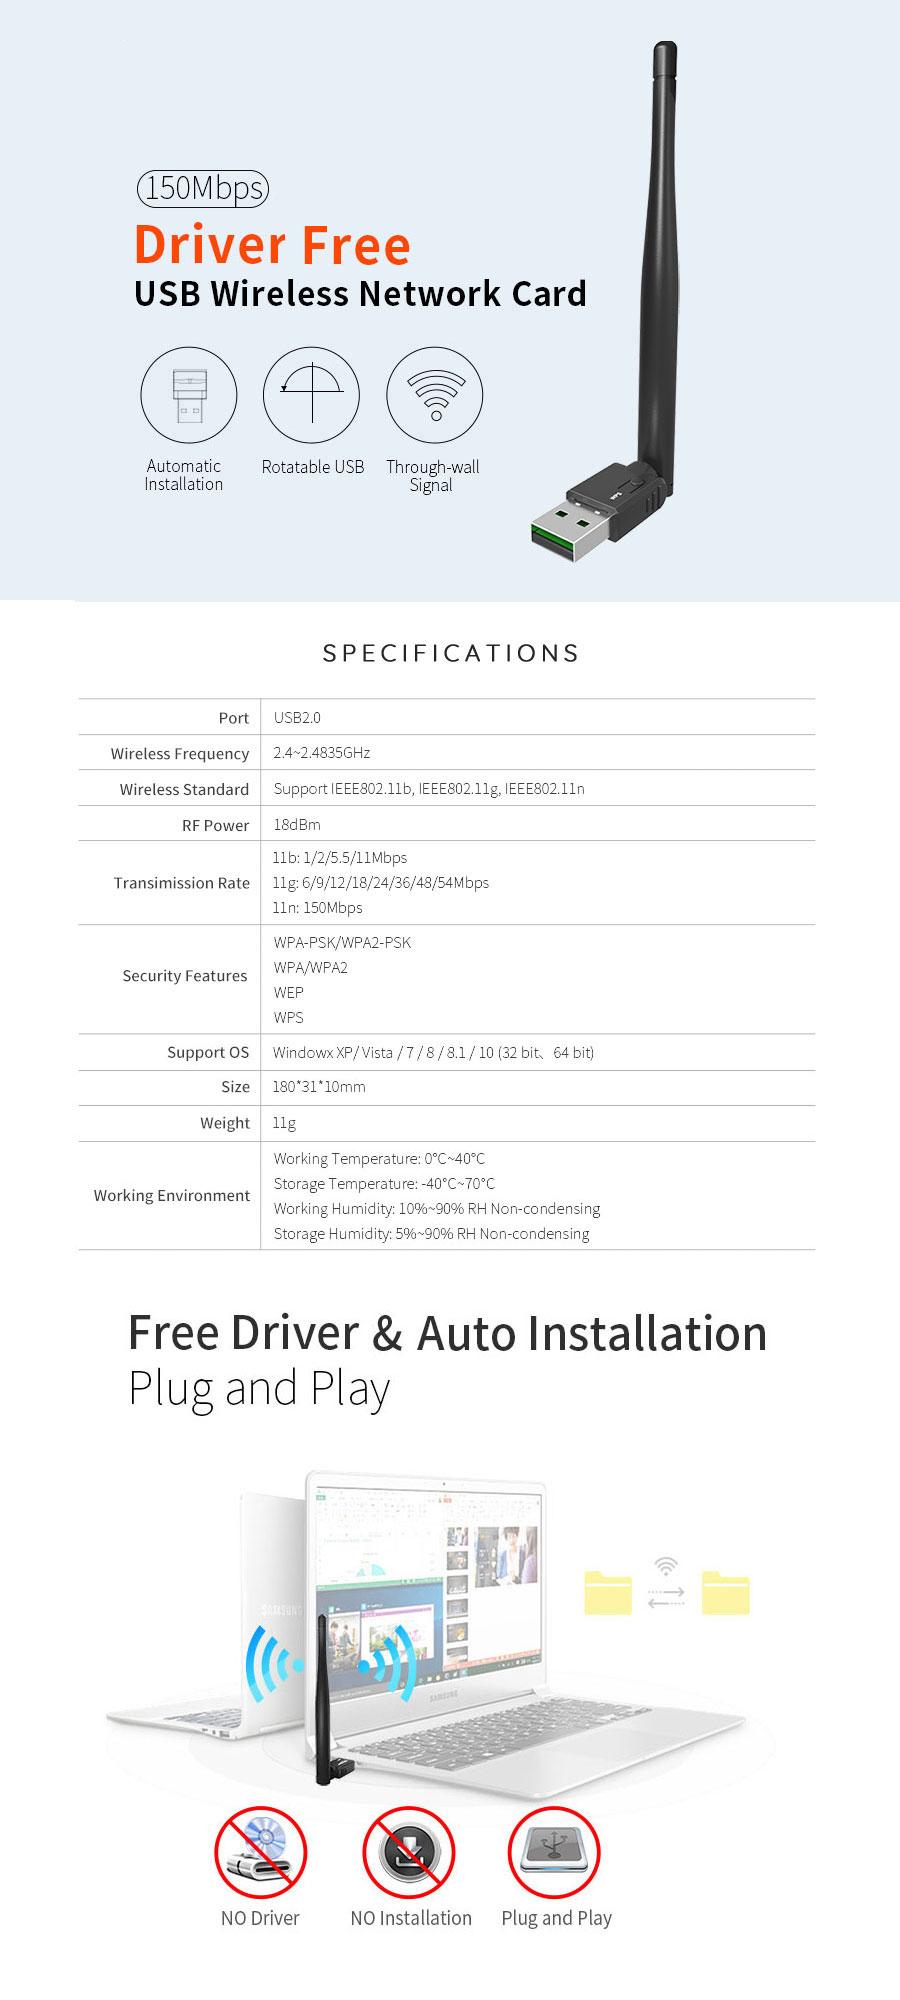 802.11 b/g/n 150Mbps 2.4GHz USB WiFi Wireless Adapter - NWEL-022 | Image